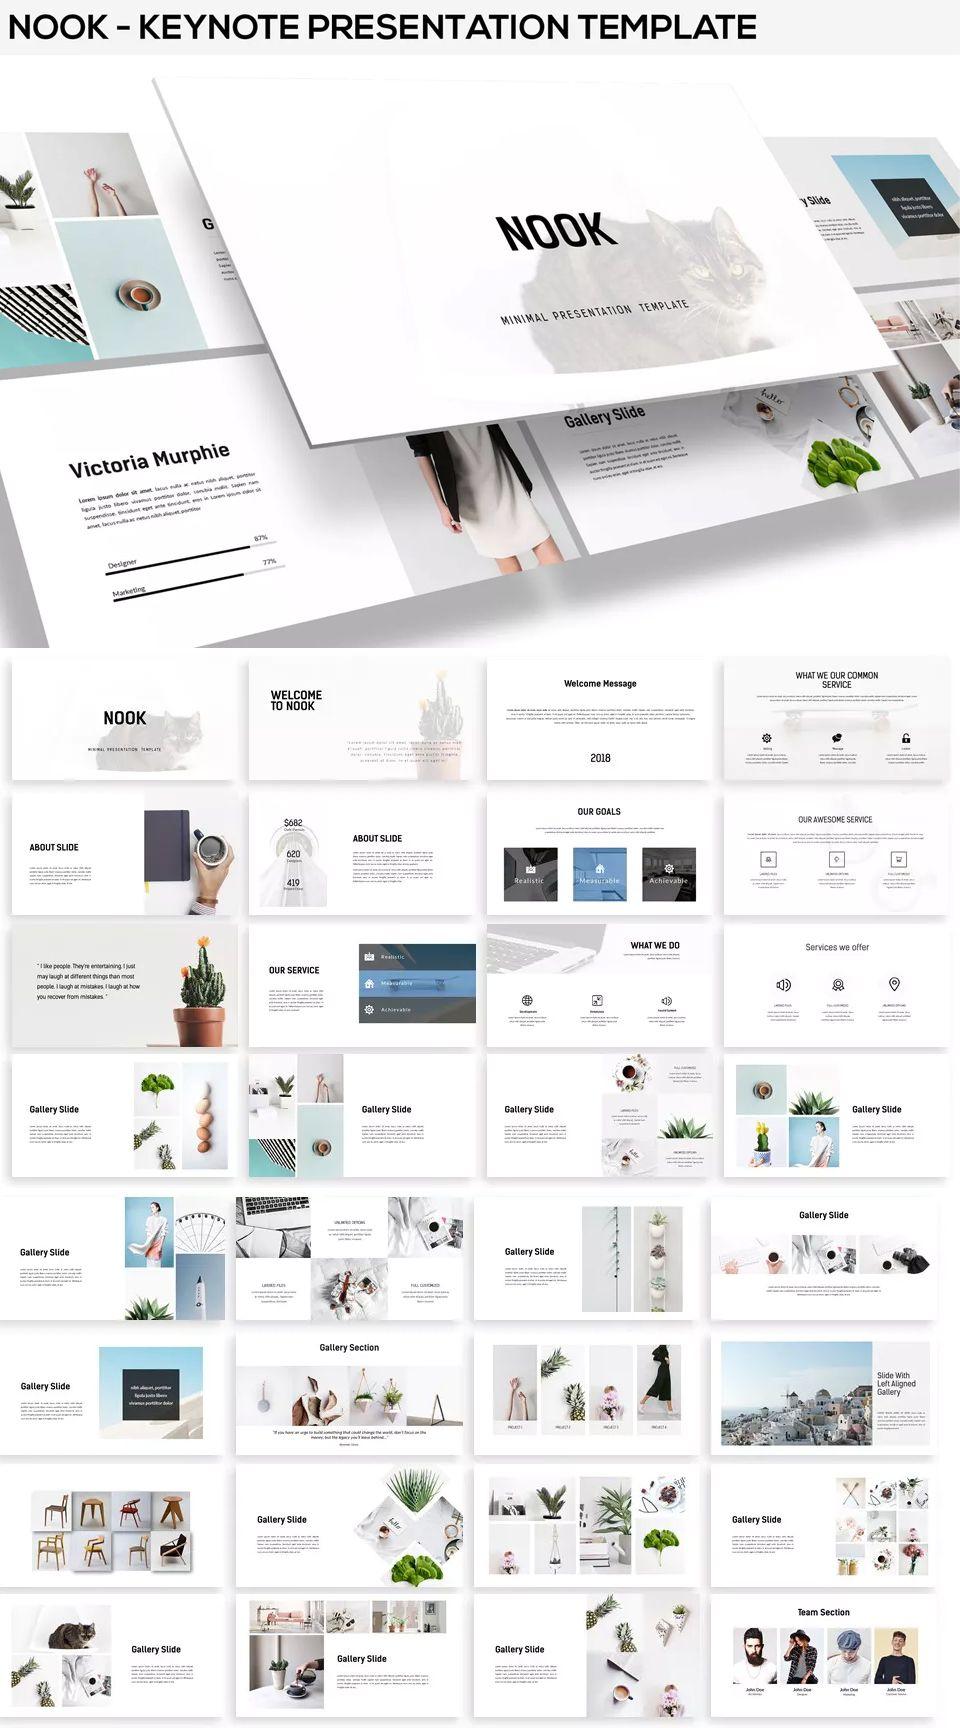 nook minimal keynote presentation template 45 multipurpose